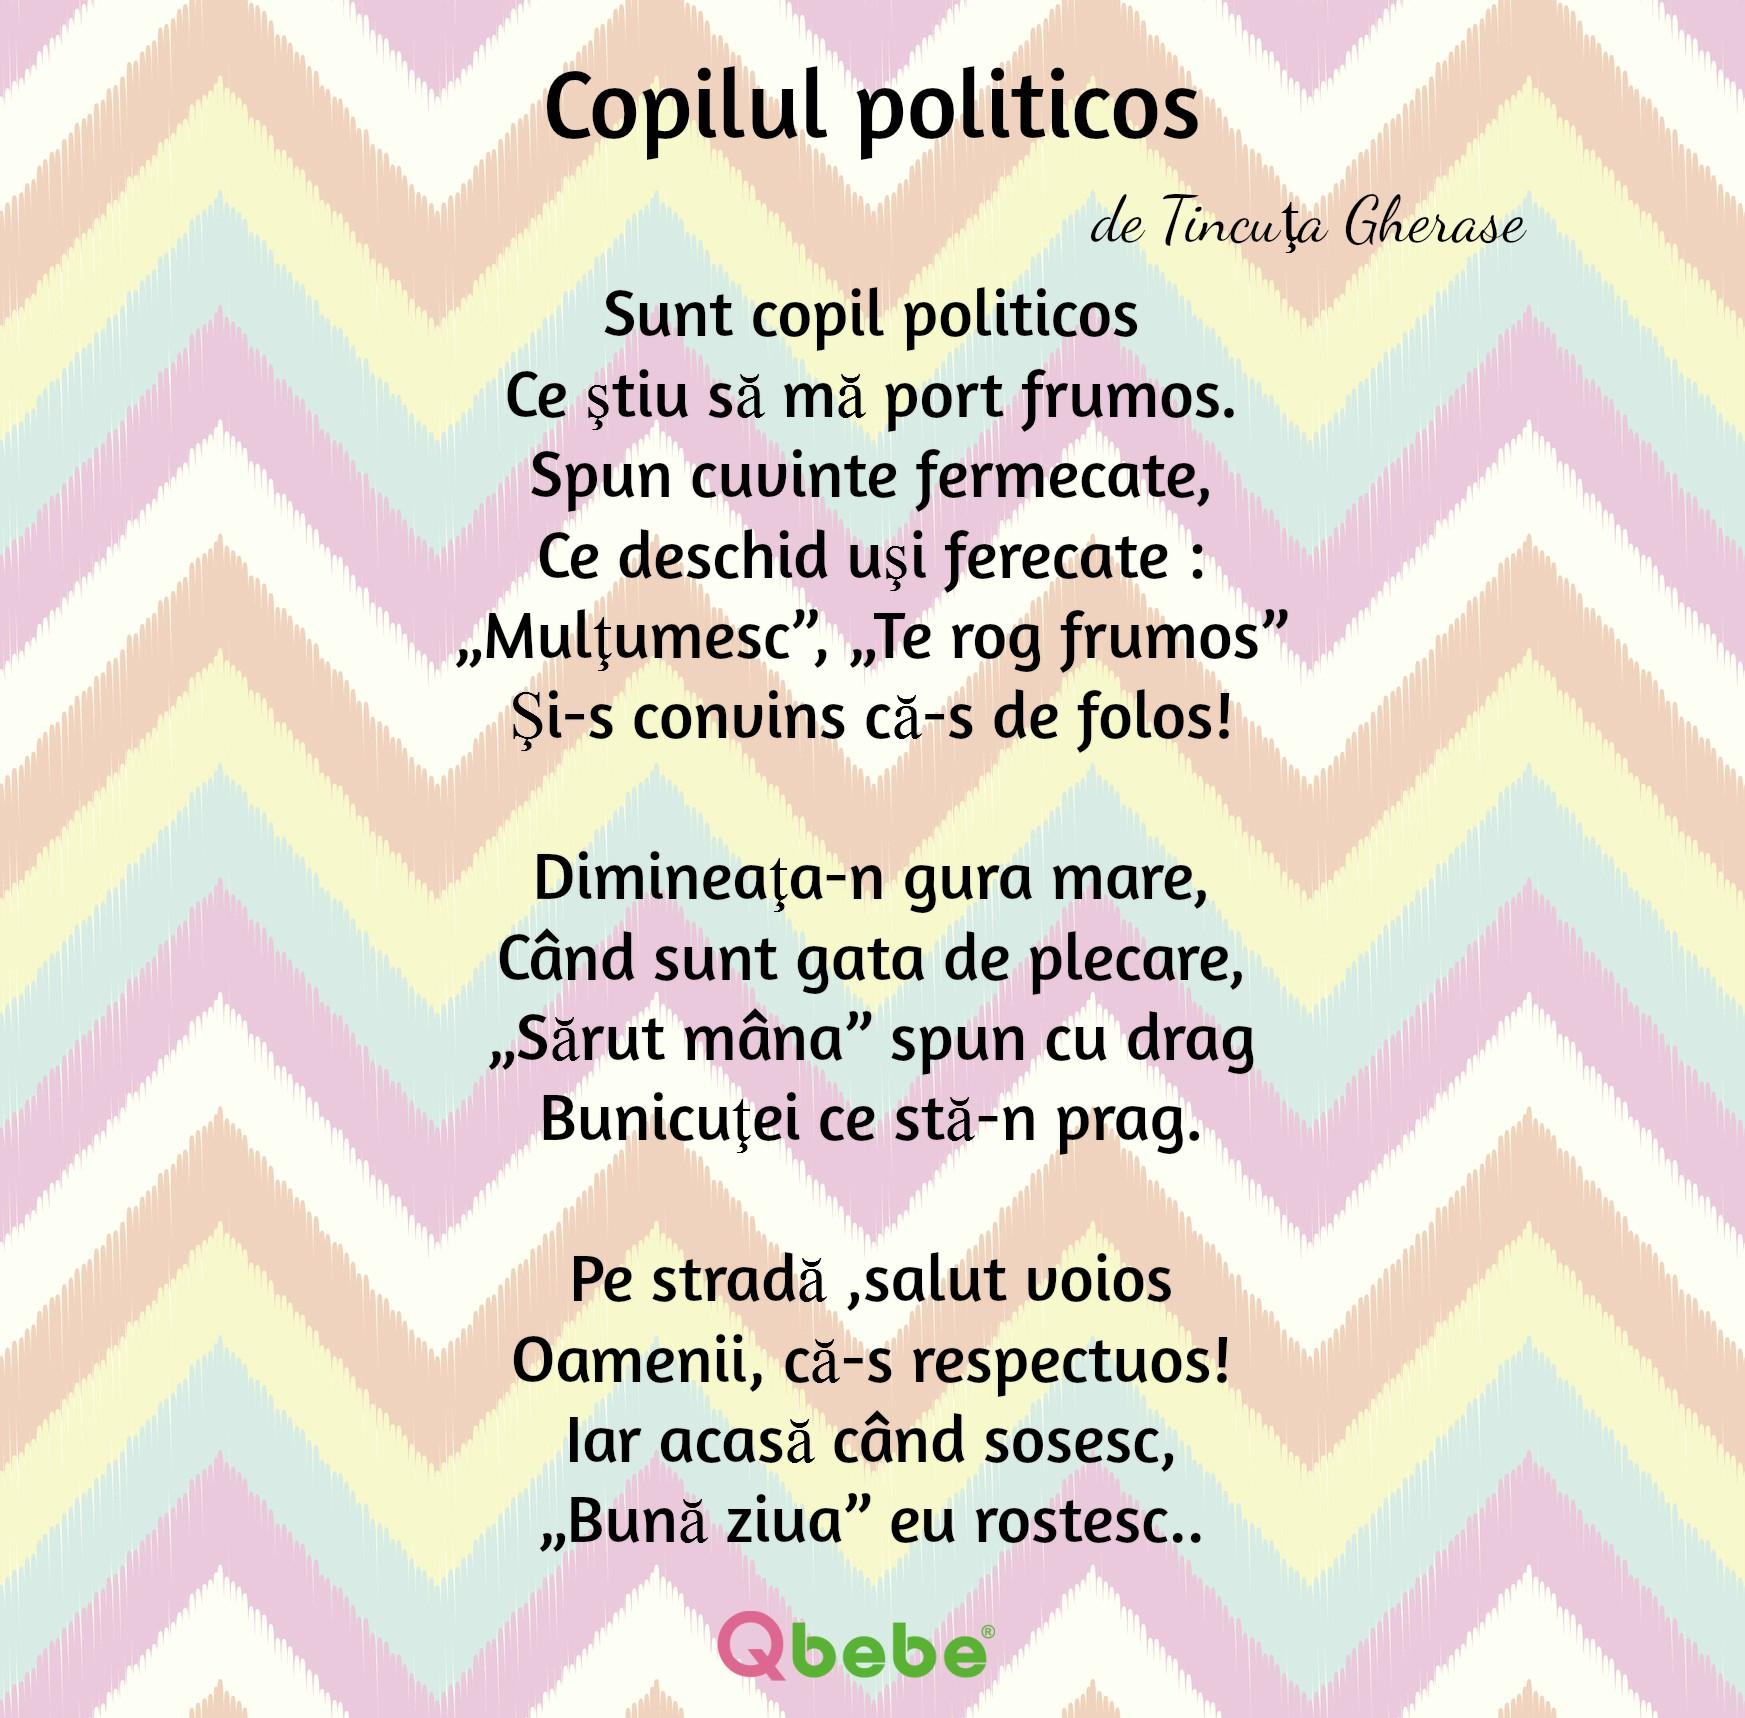 Copilul politicos